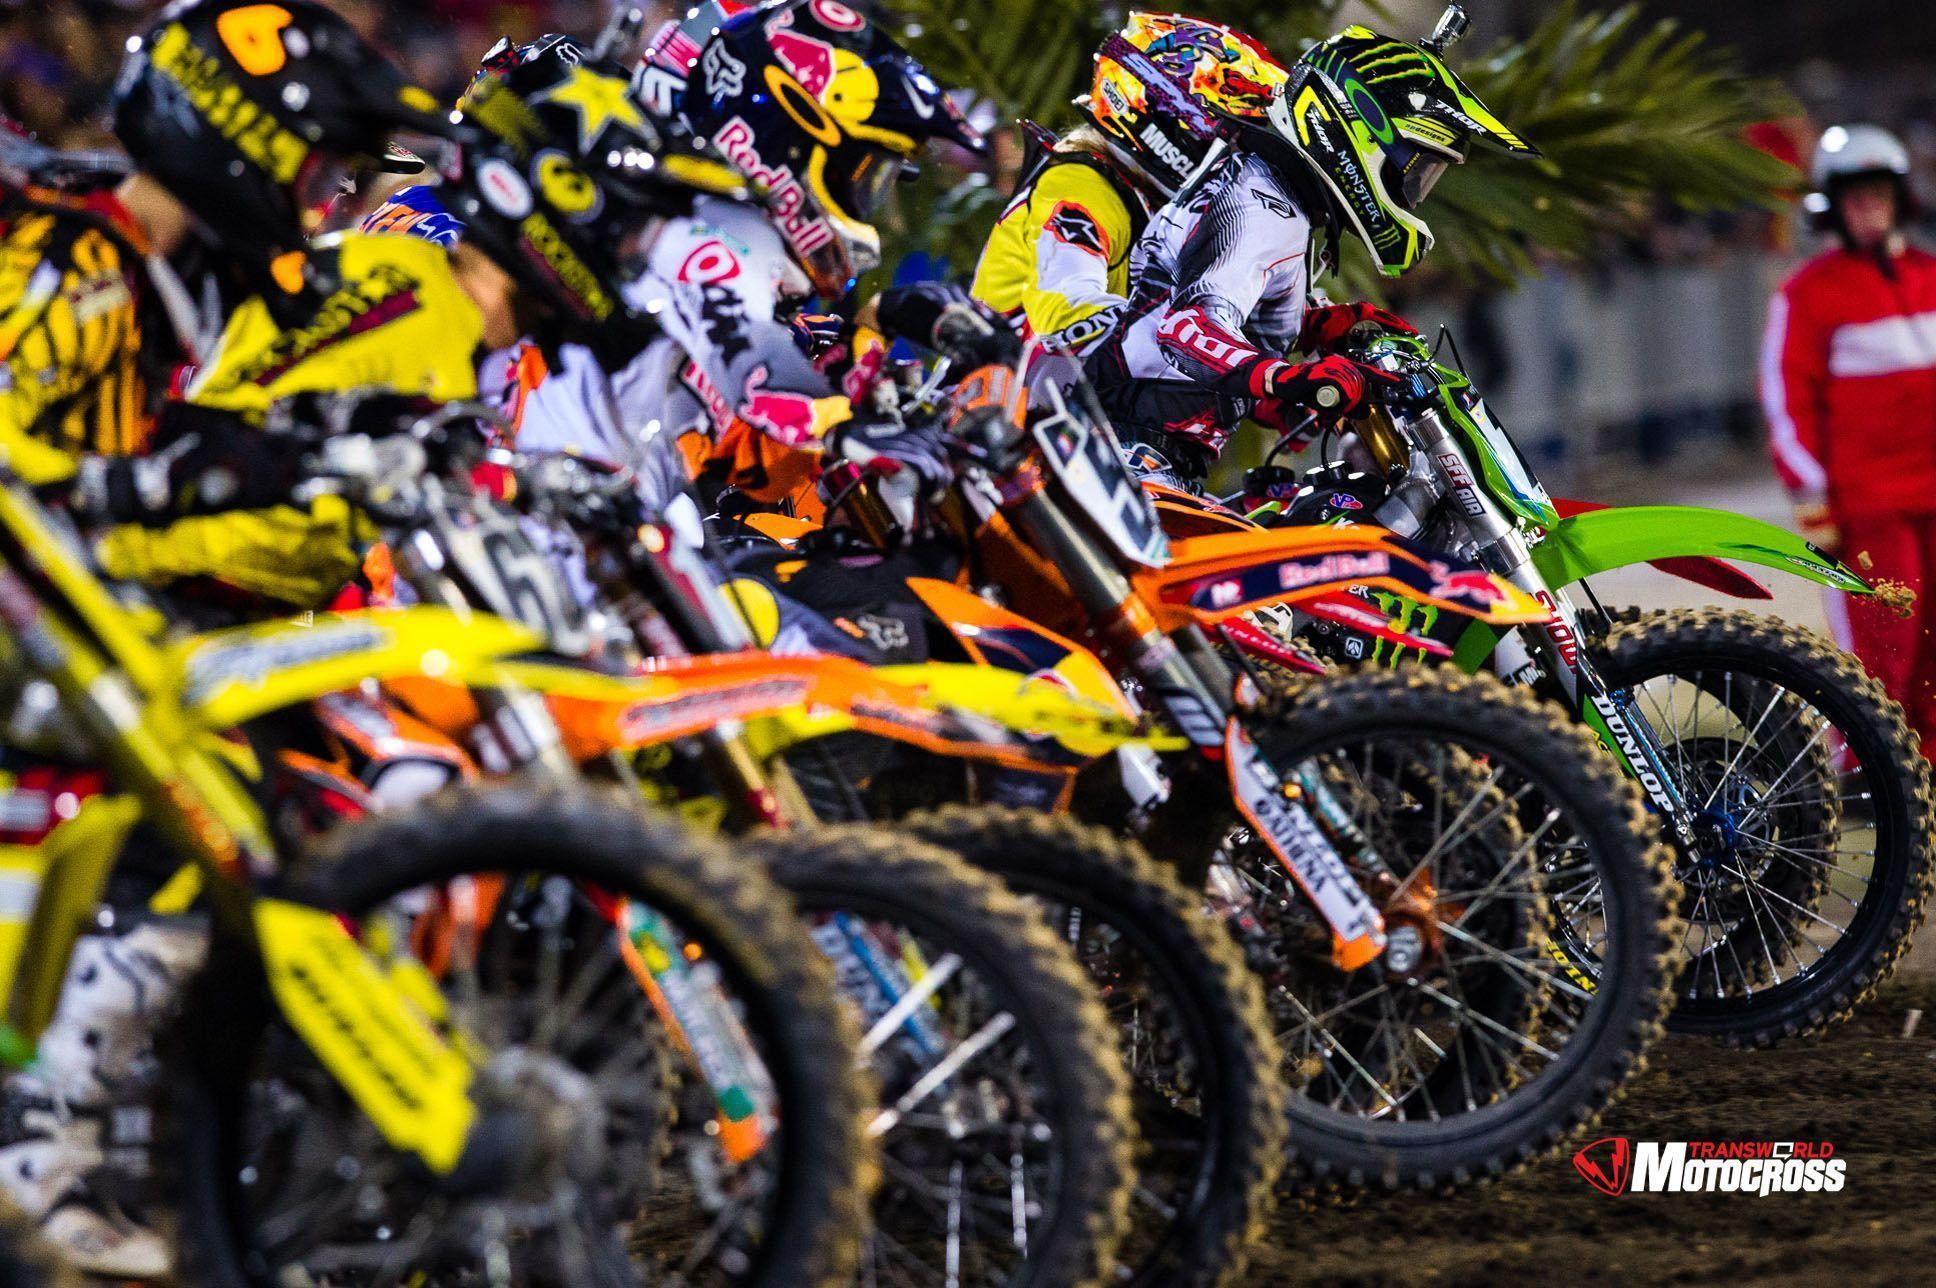 suzuki motocross bike hd - photo #34